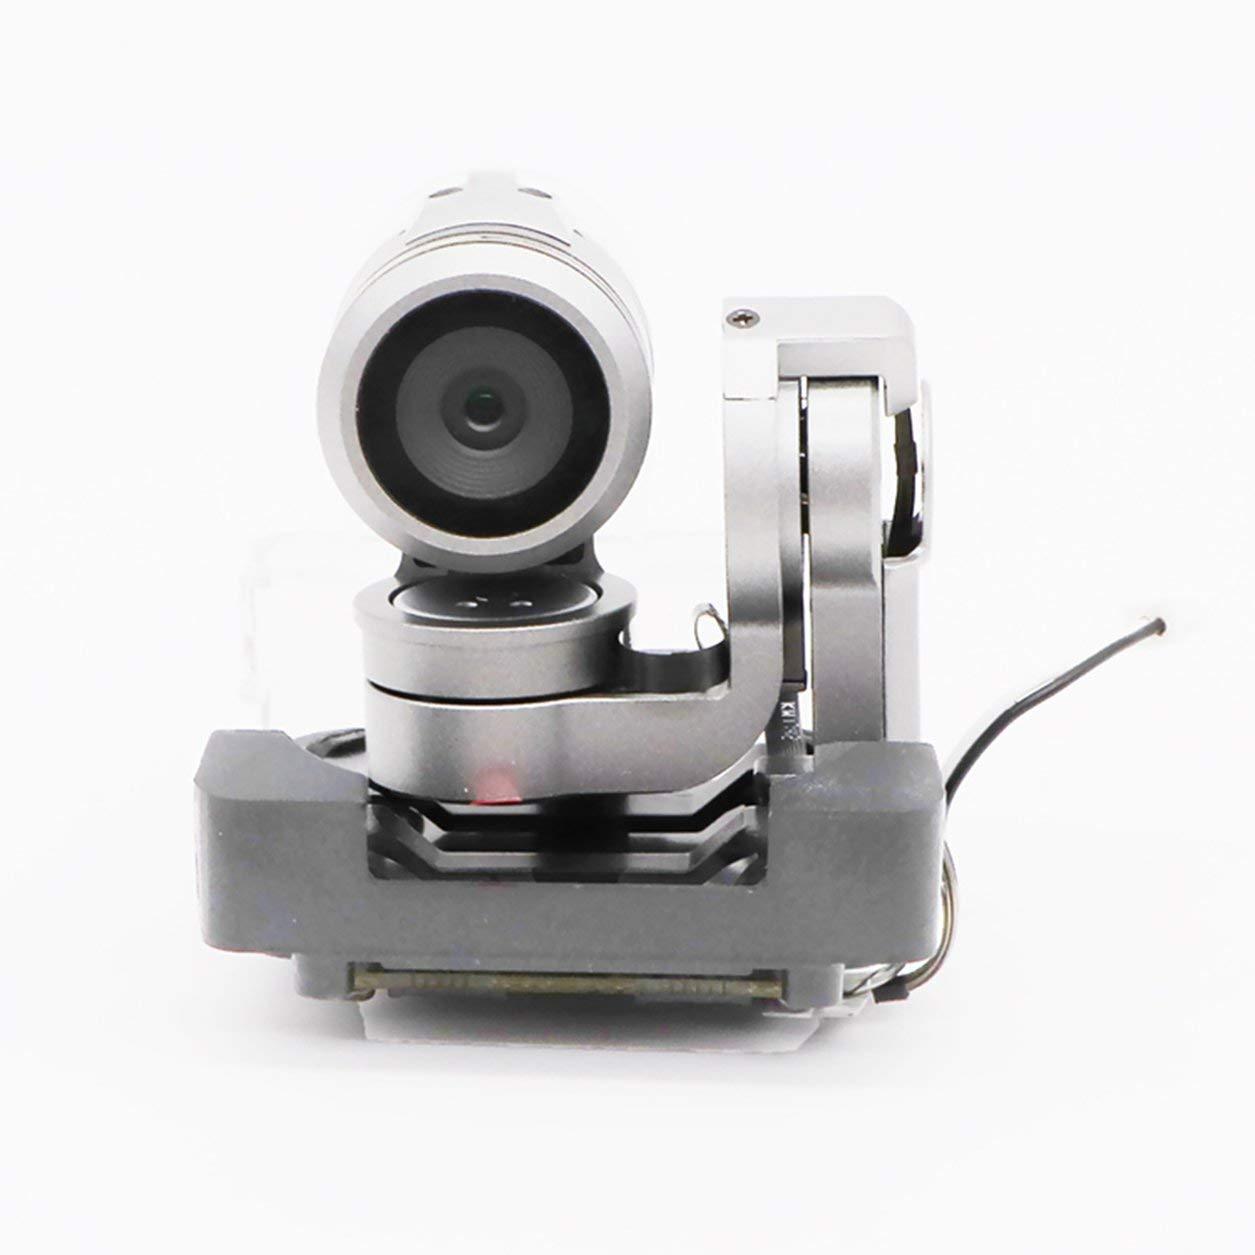 Saikogoods DJIマヴィックプロの交換修理部品のビデオRCカムオリジナルドローンアクセサリについては取締役会でドローンジンバルカメラ   B07MZ4DC4D